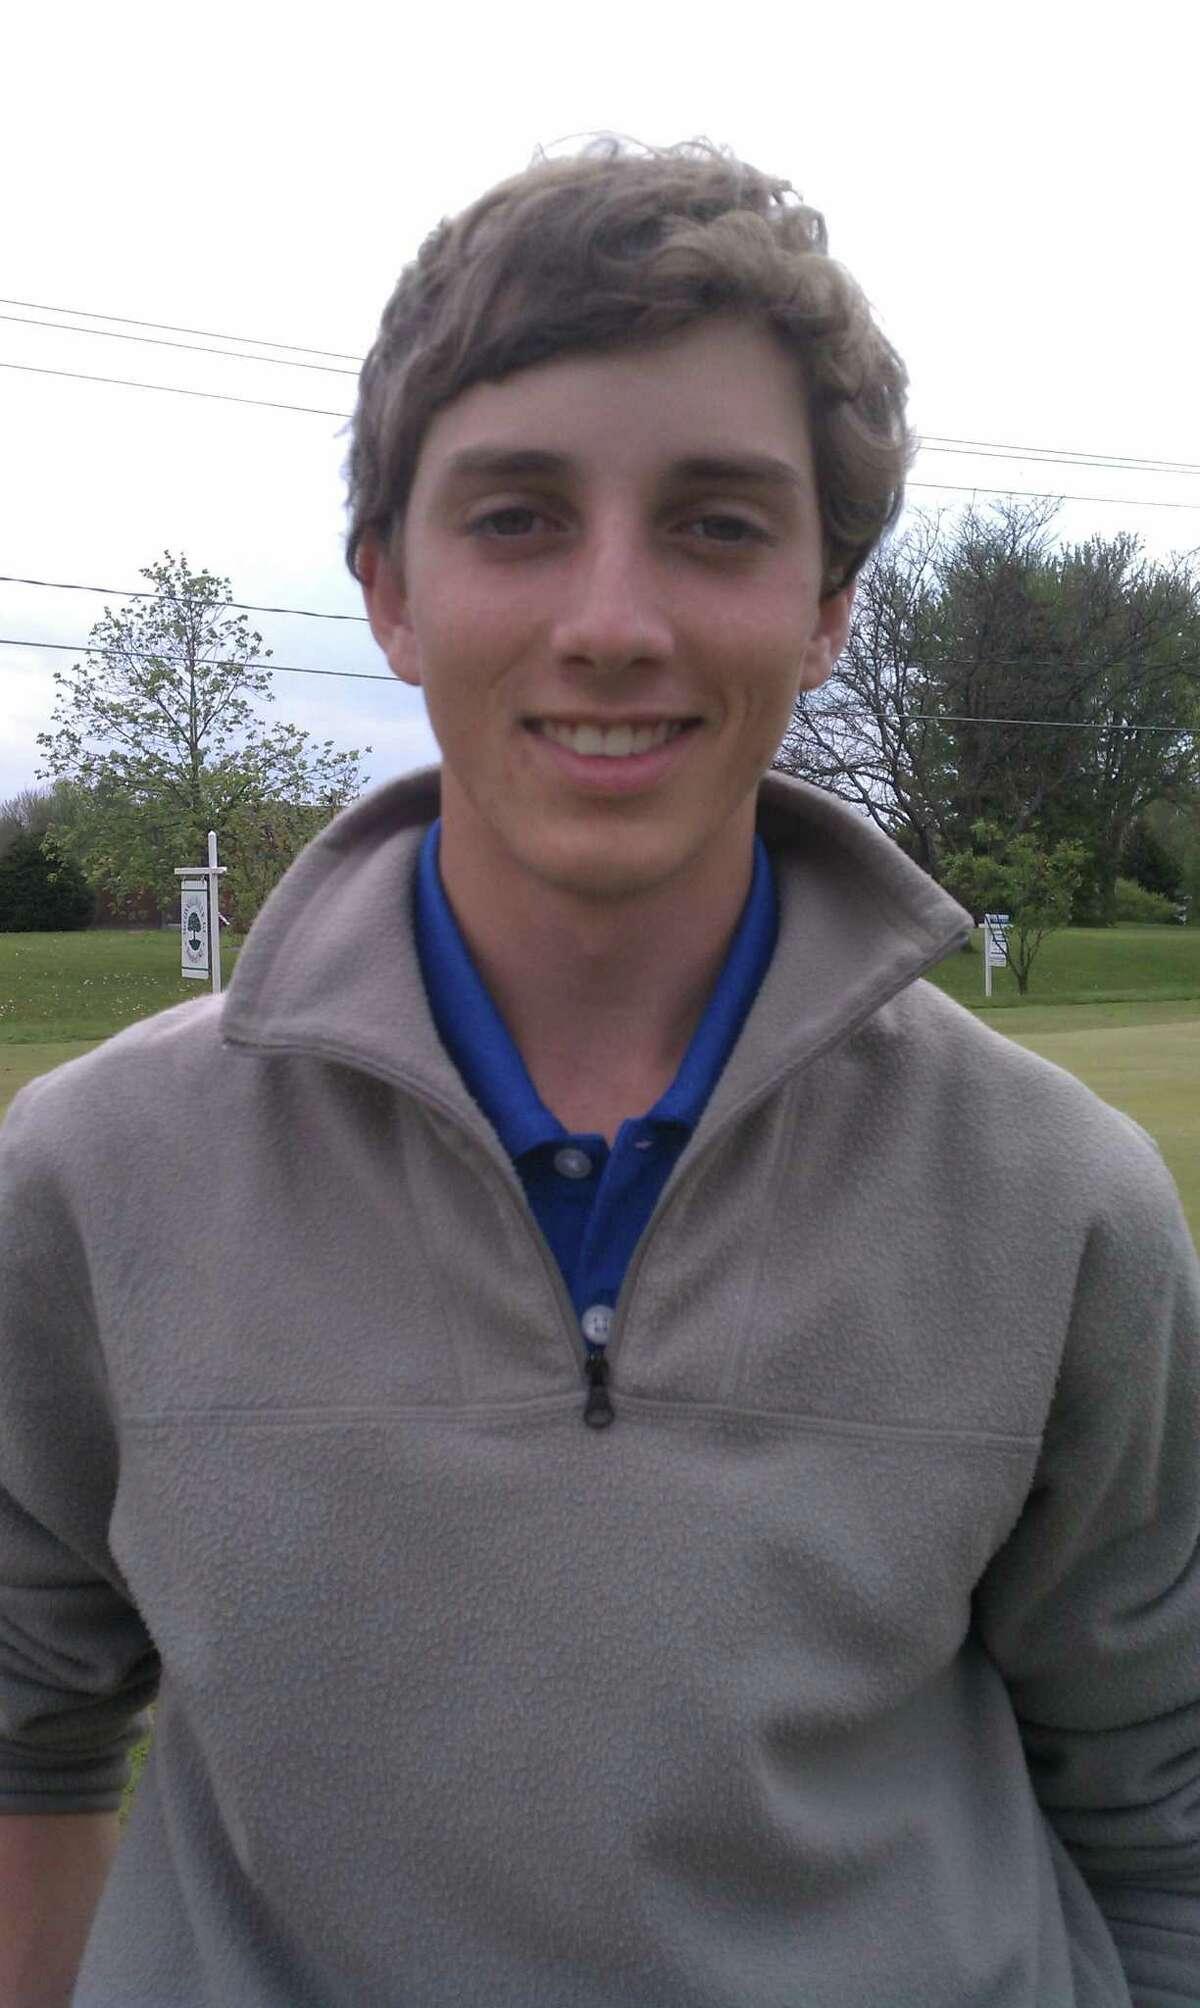 Seth Adams, Camden golf